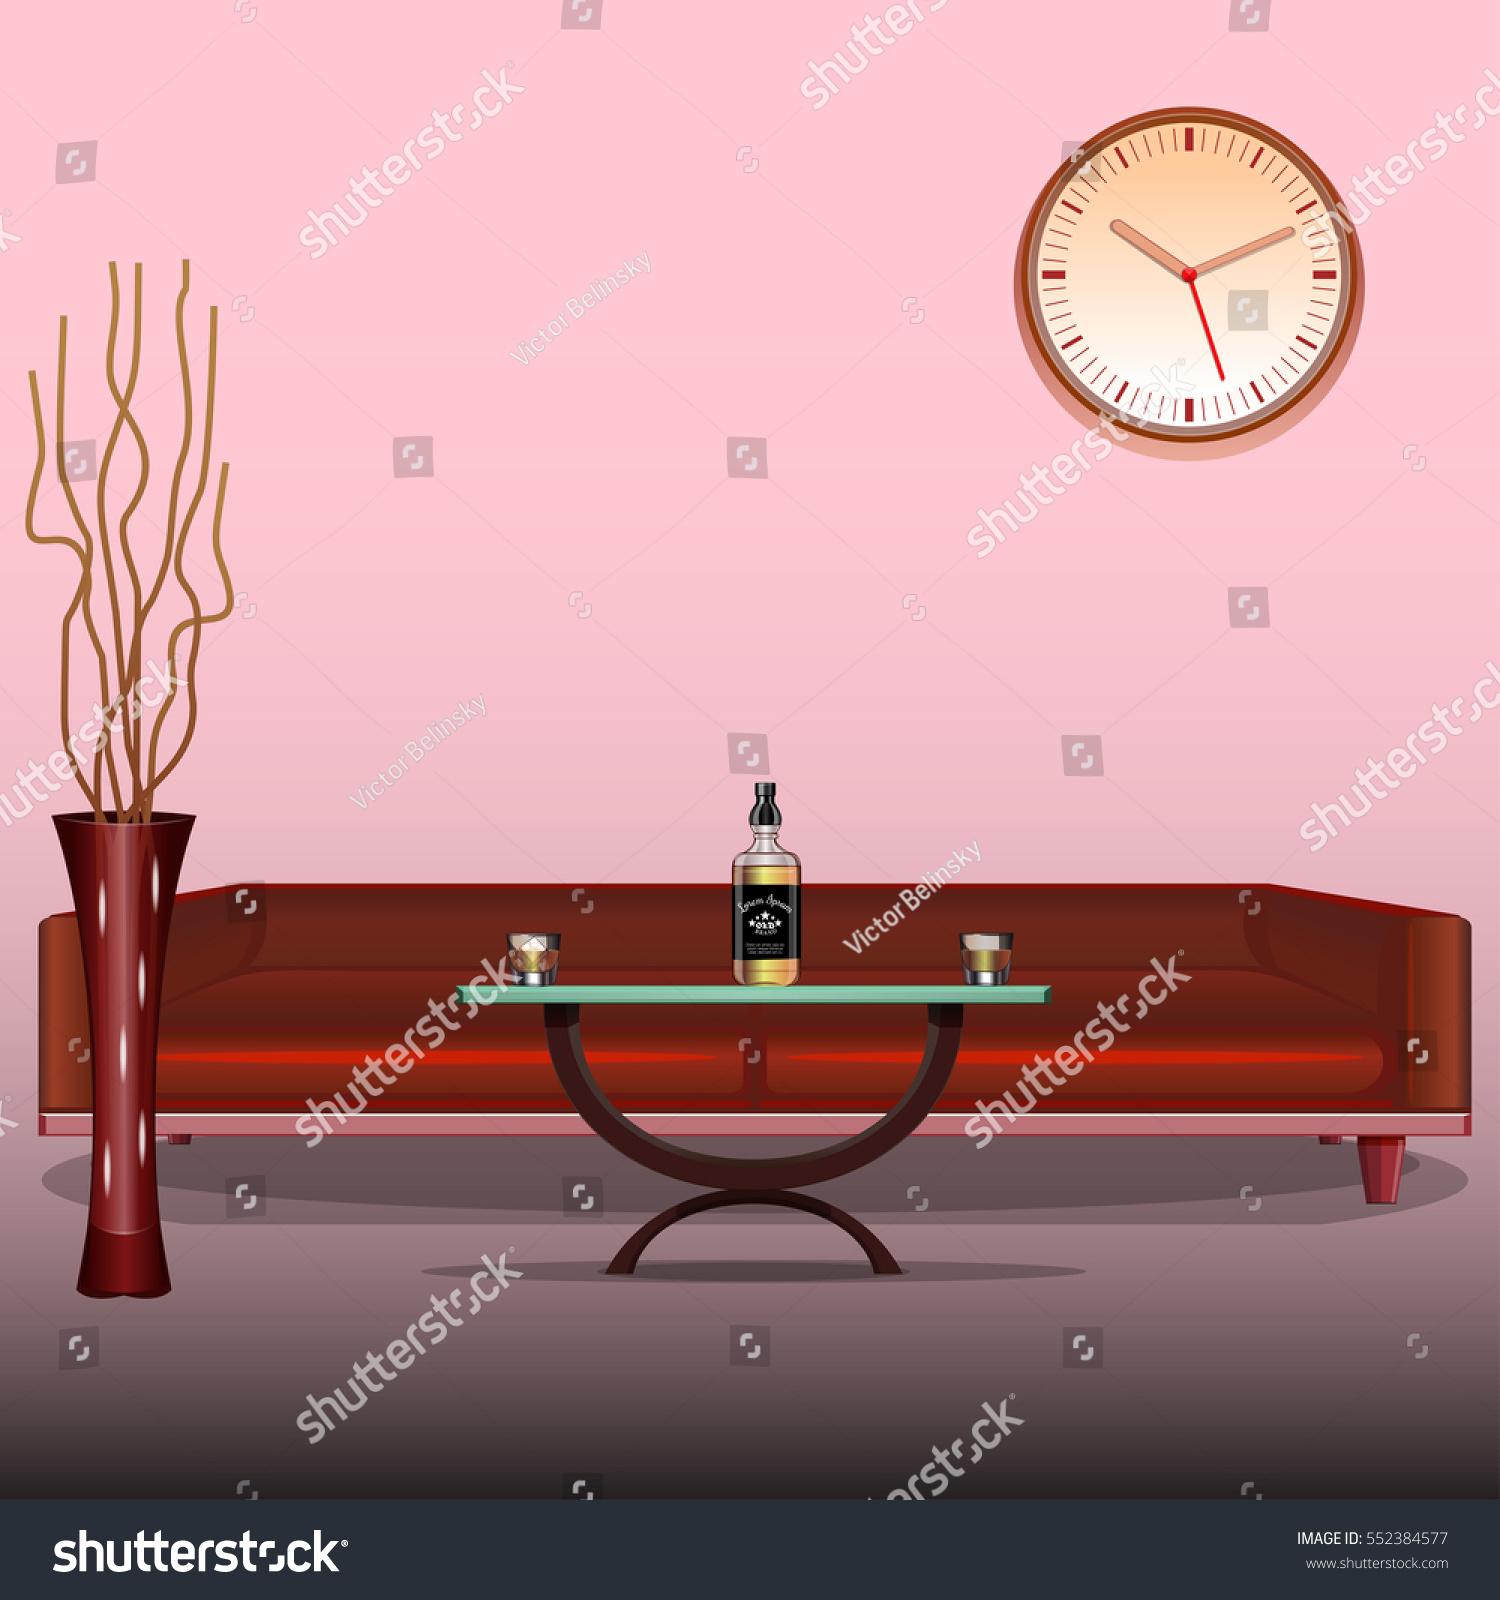 Art interior living room design template stock vector 552384577 art interior living room design template red sofa liquor whiskey cognac pronofoot35fo Image collections